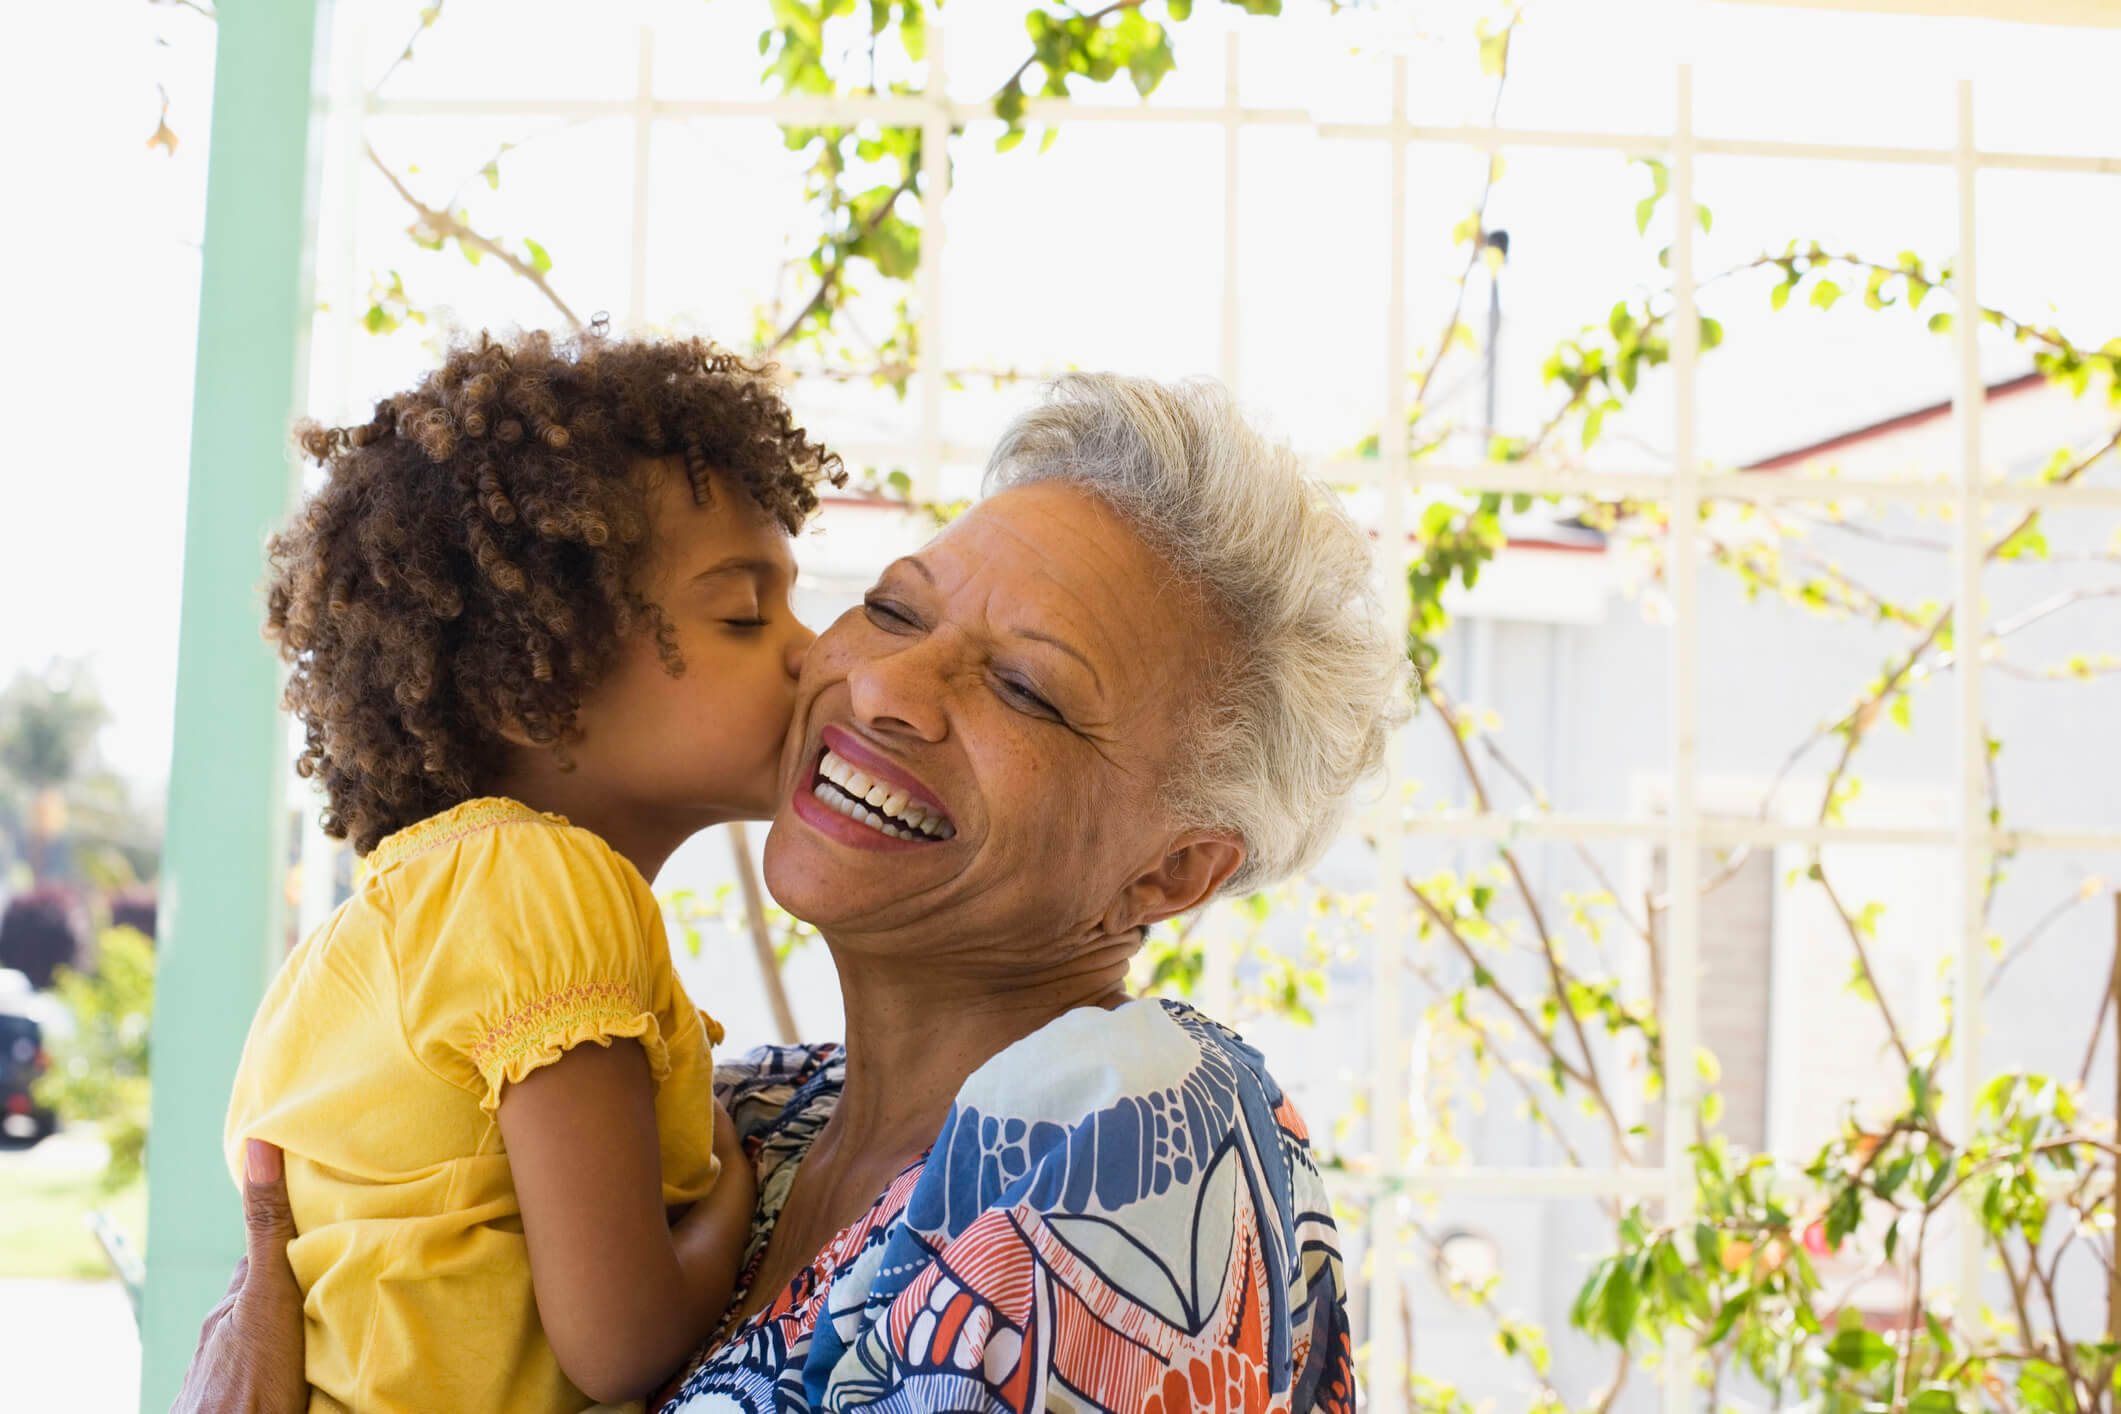 Child Kissing Grandmother on Cheek